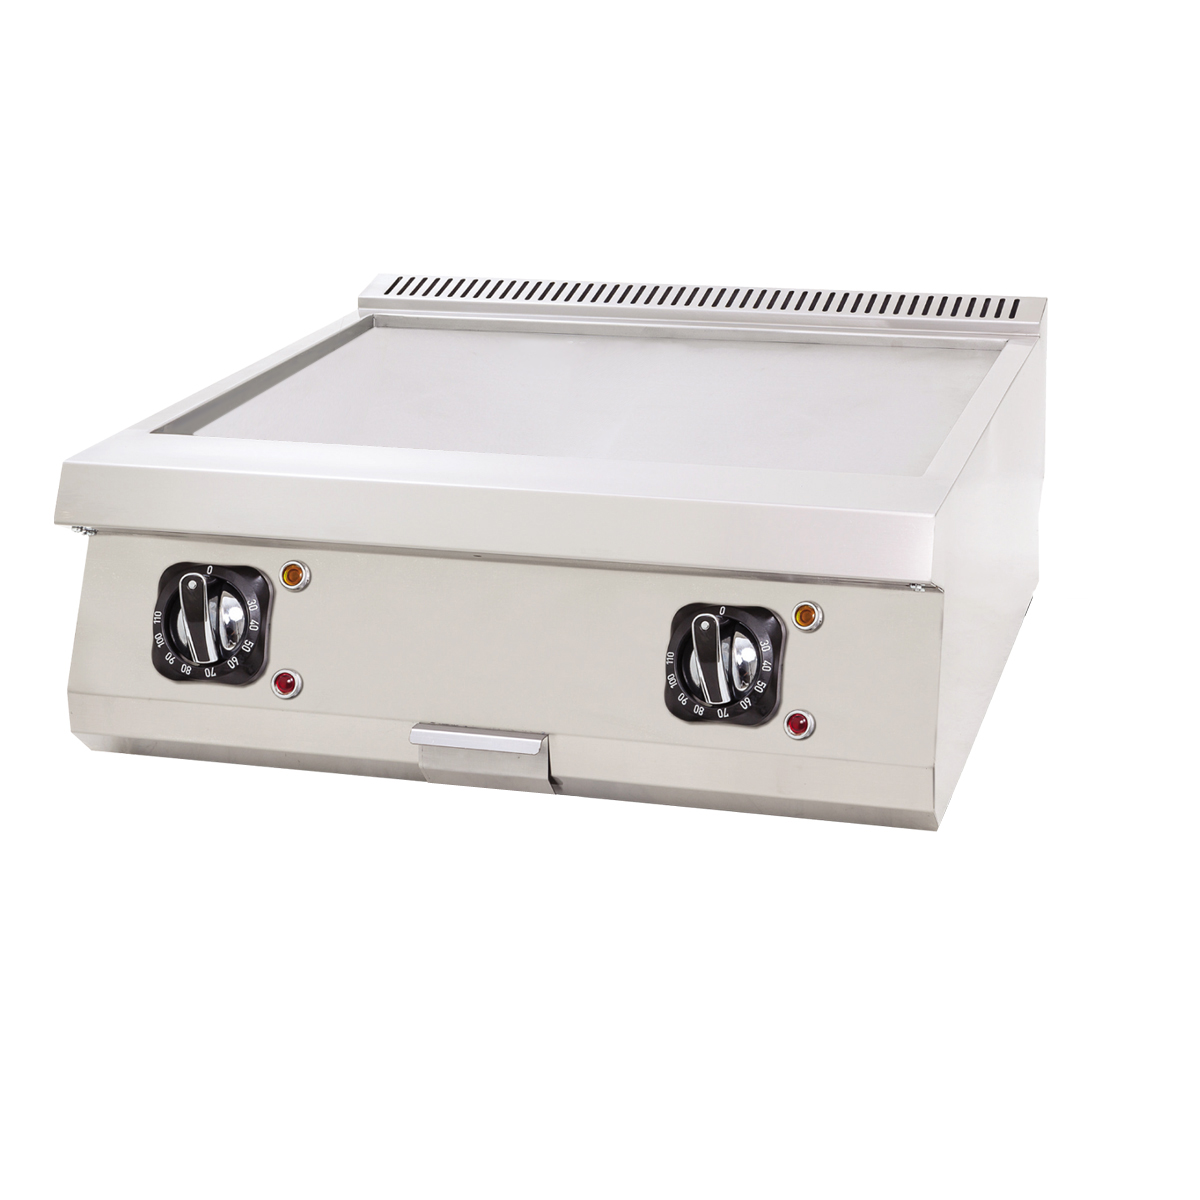 Electric Grill Flat - 80x60